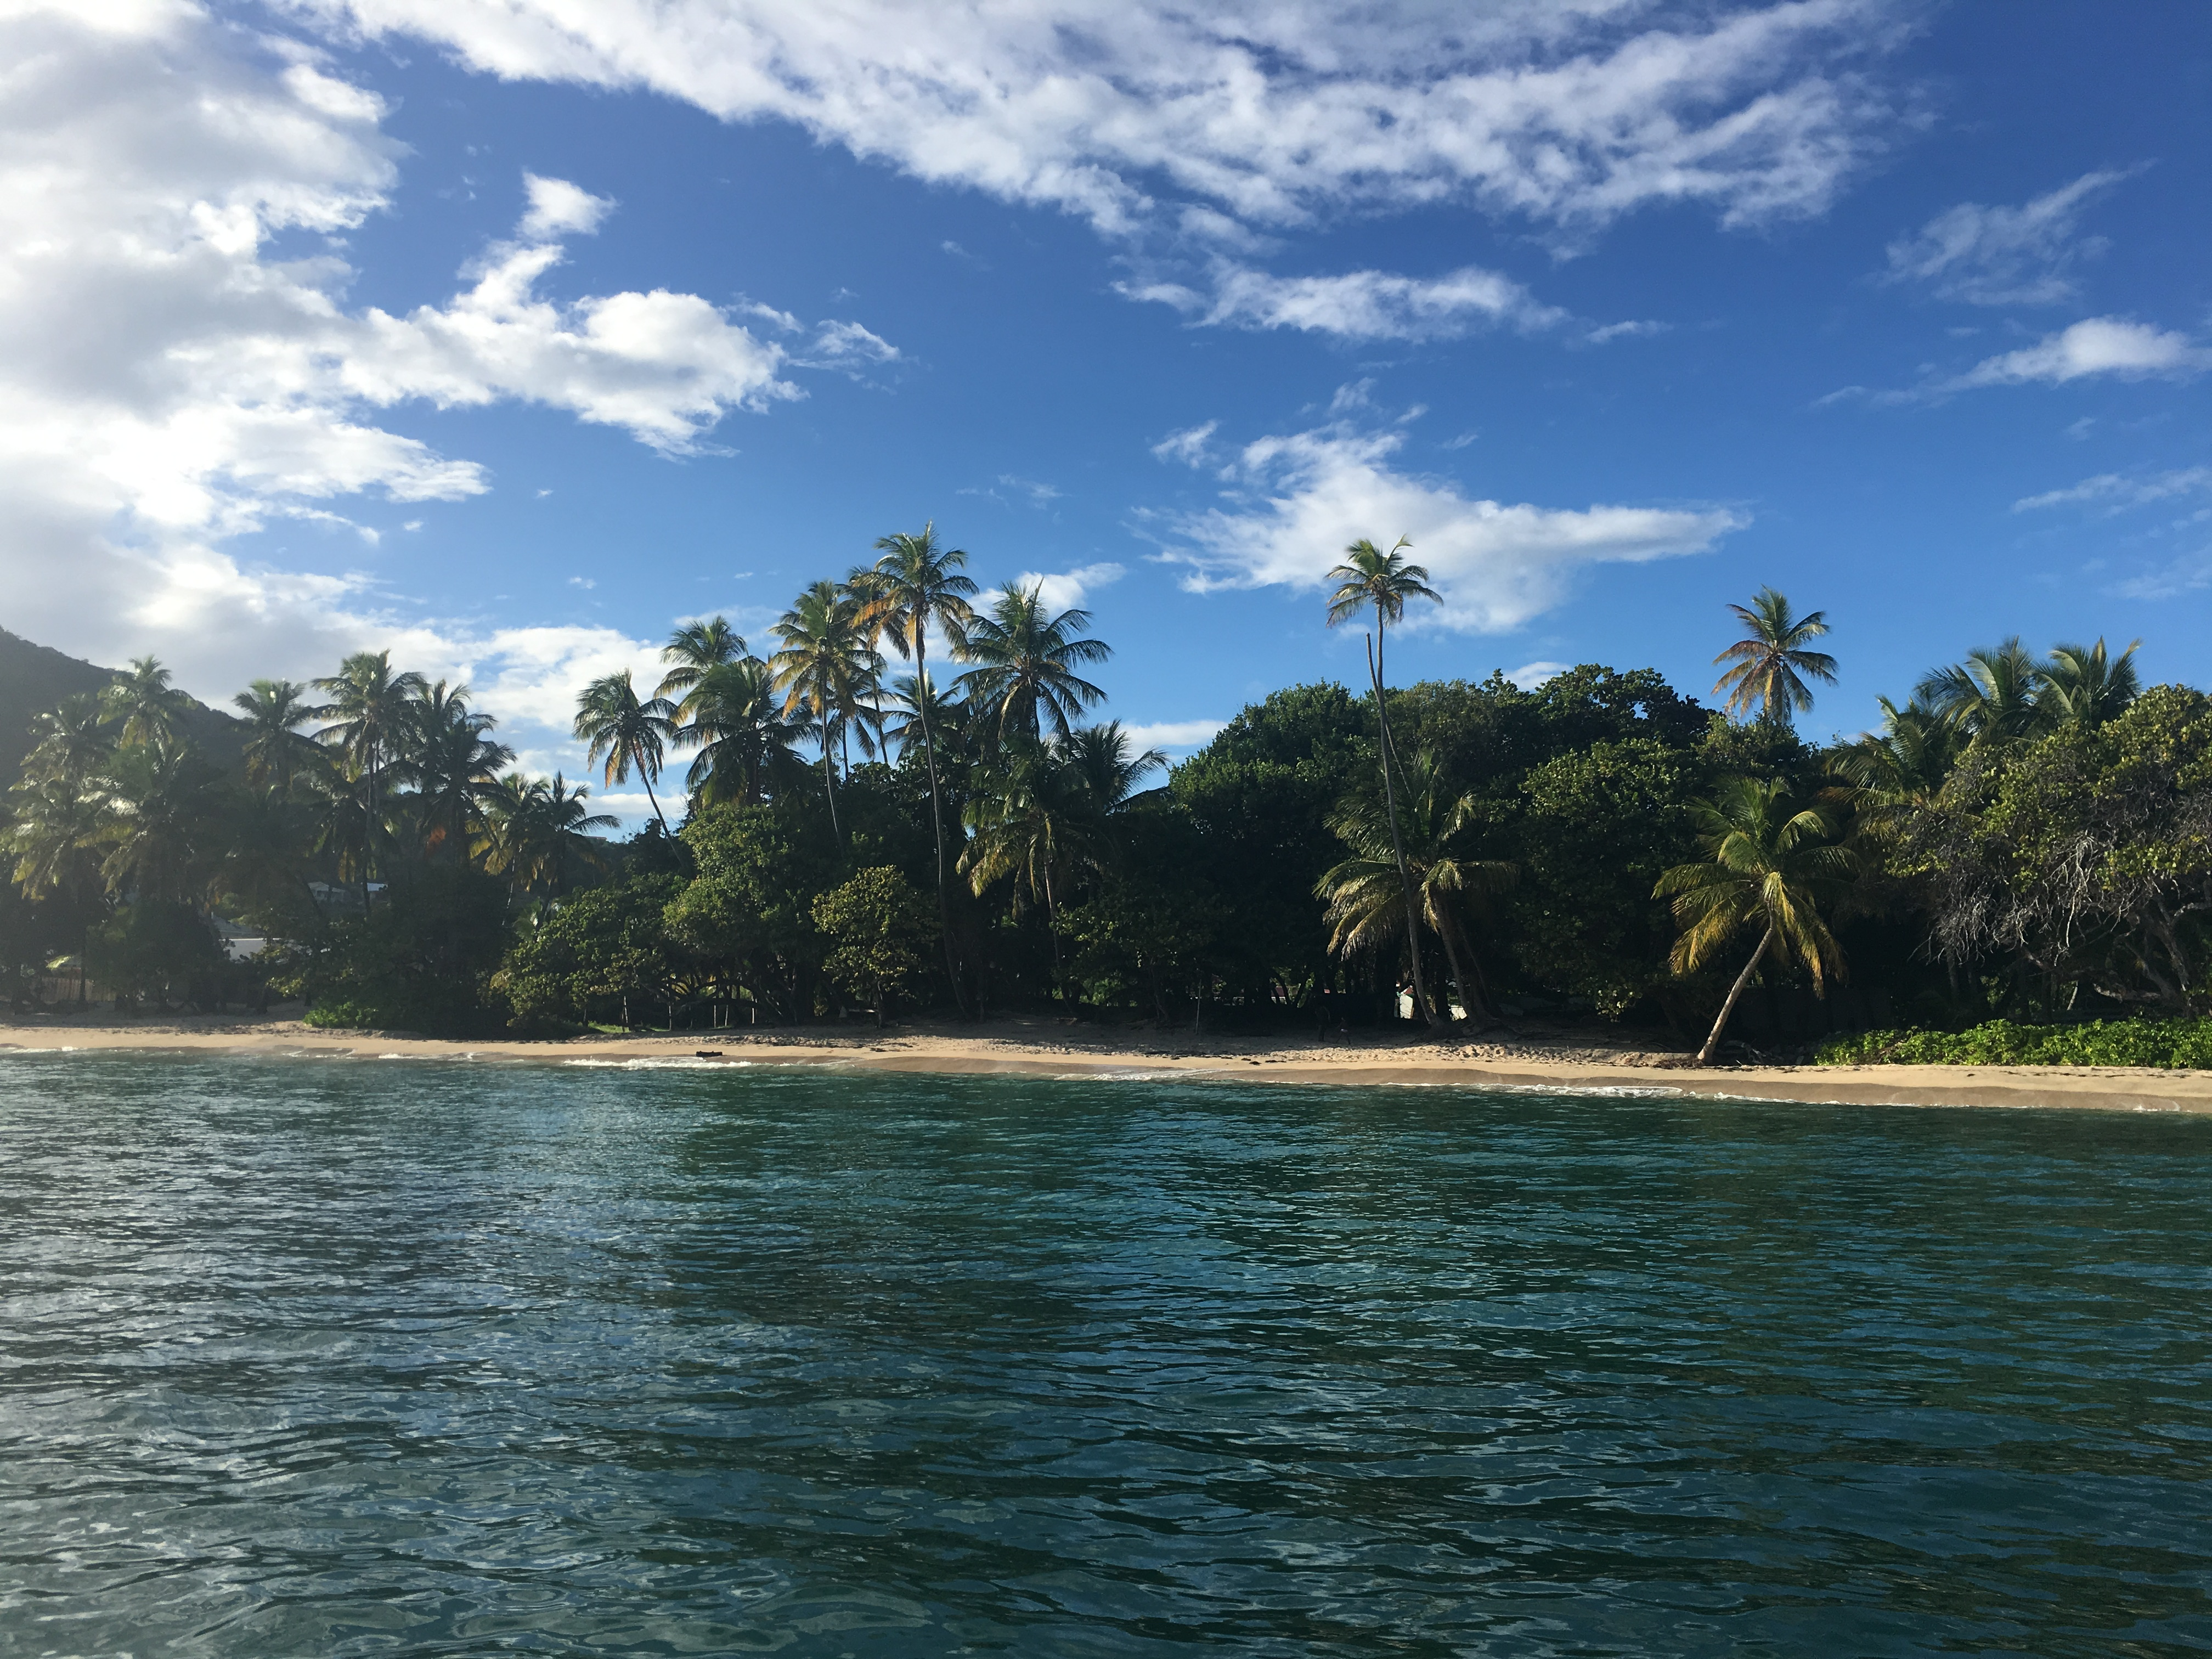 Passing Caribbean shoreline.